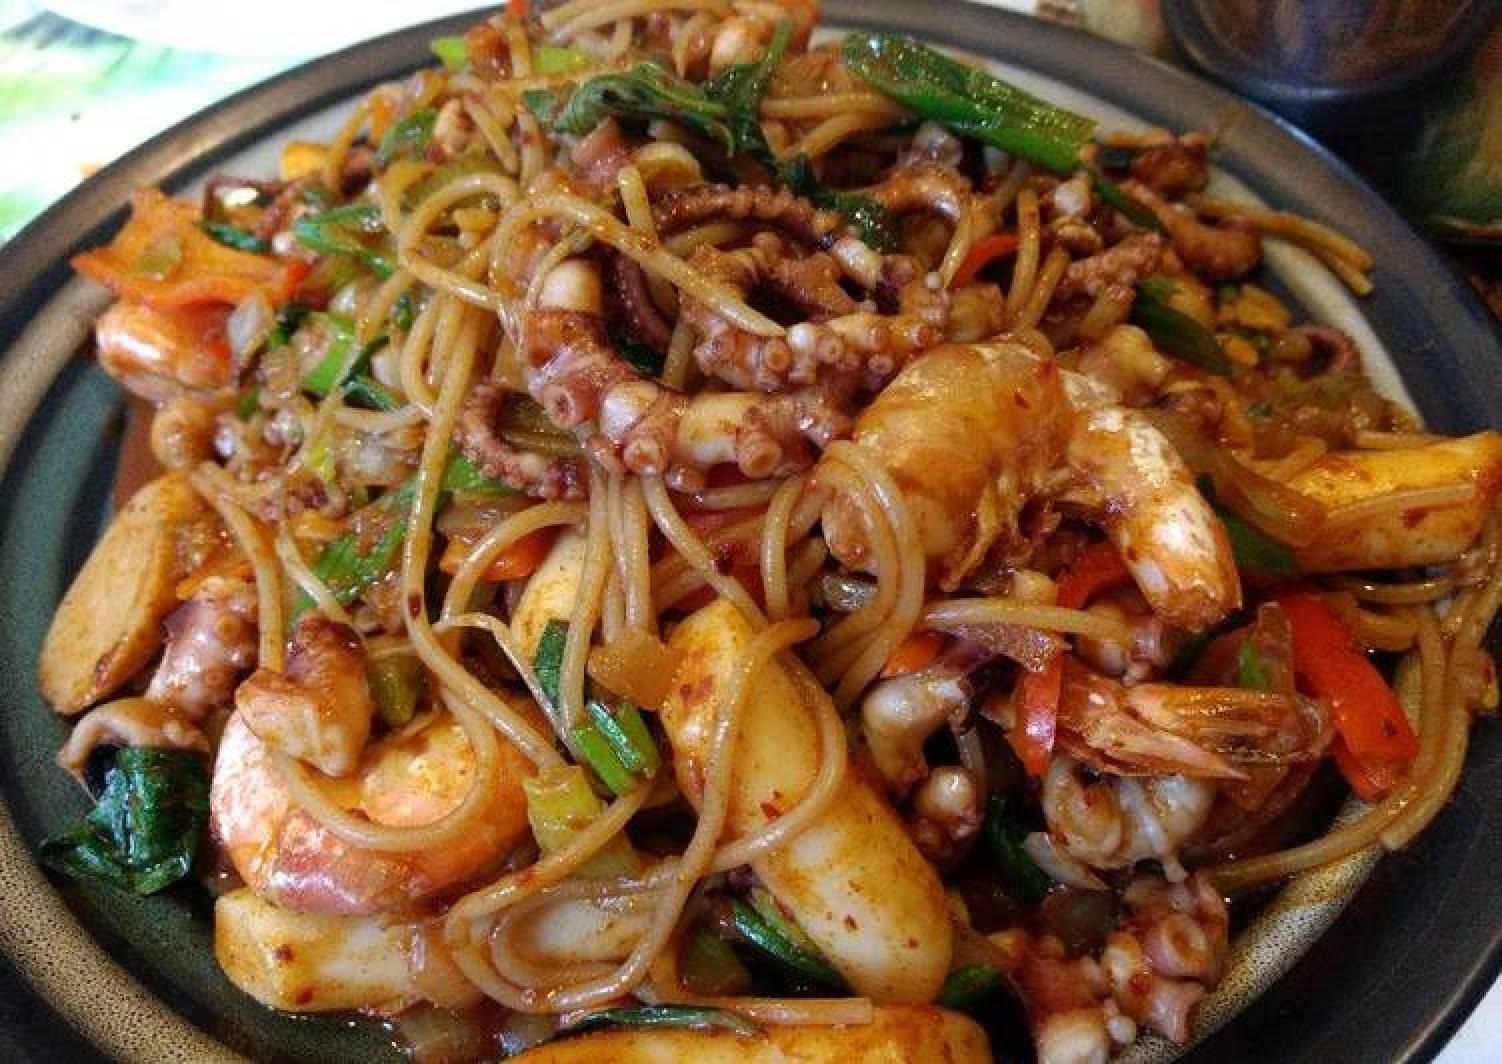 Korean spicy octopus shrimp rice noodle 炒辣章鱼🐙年糕